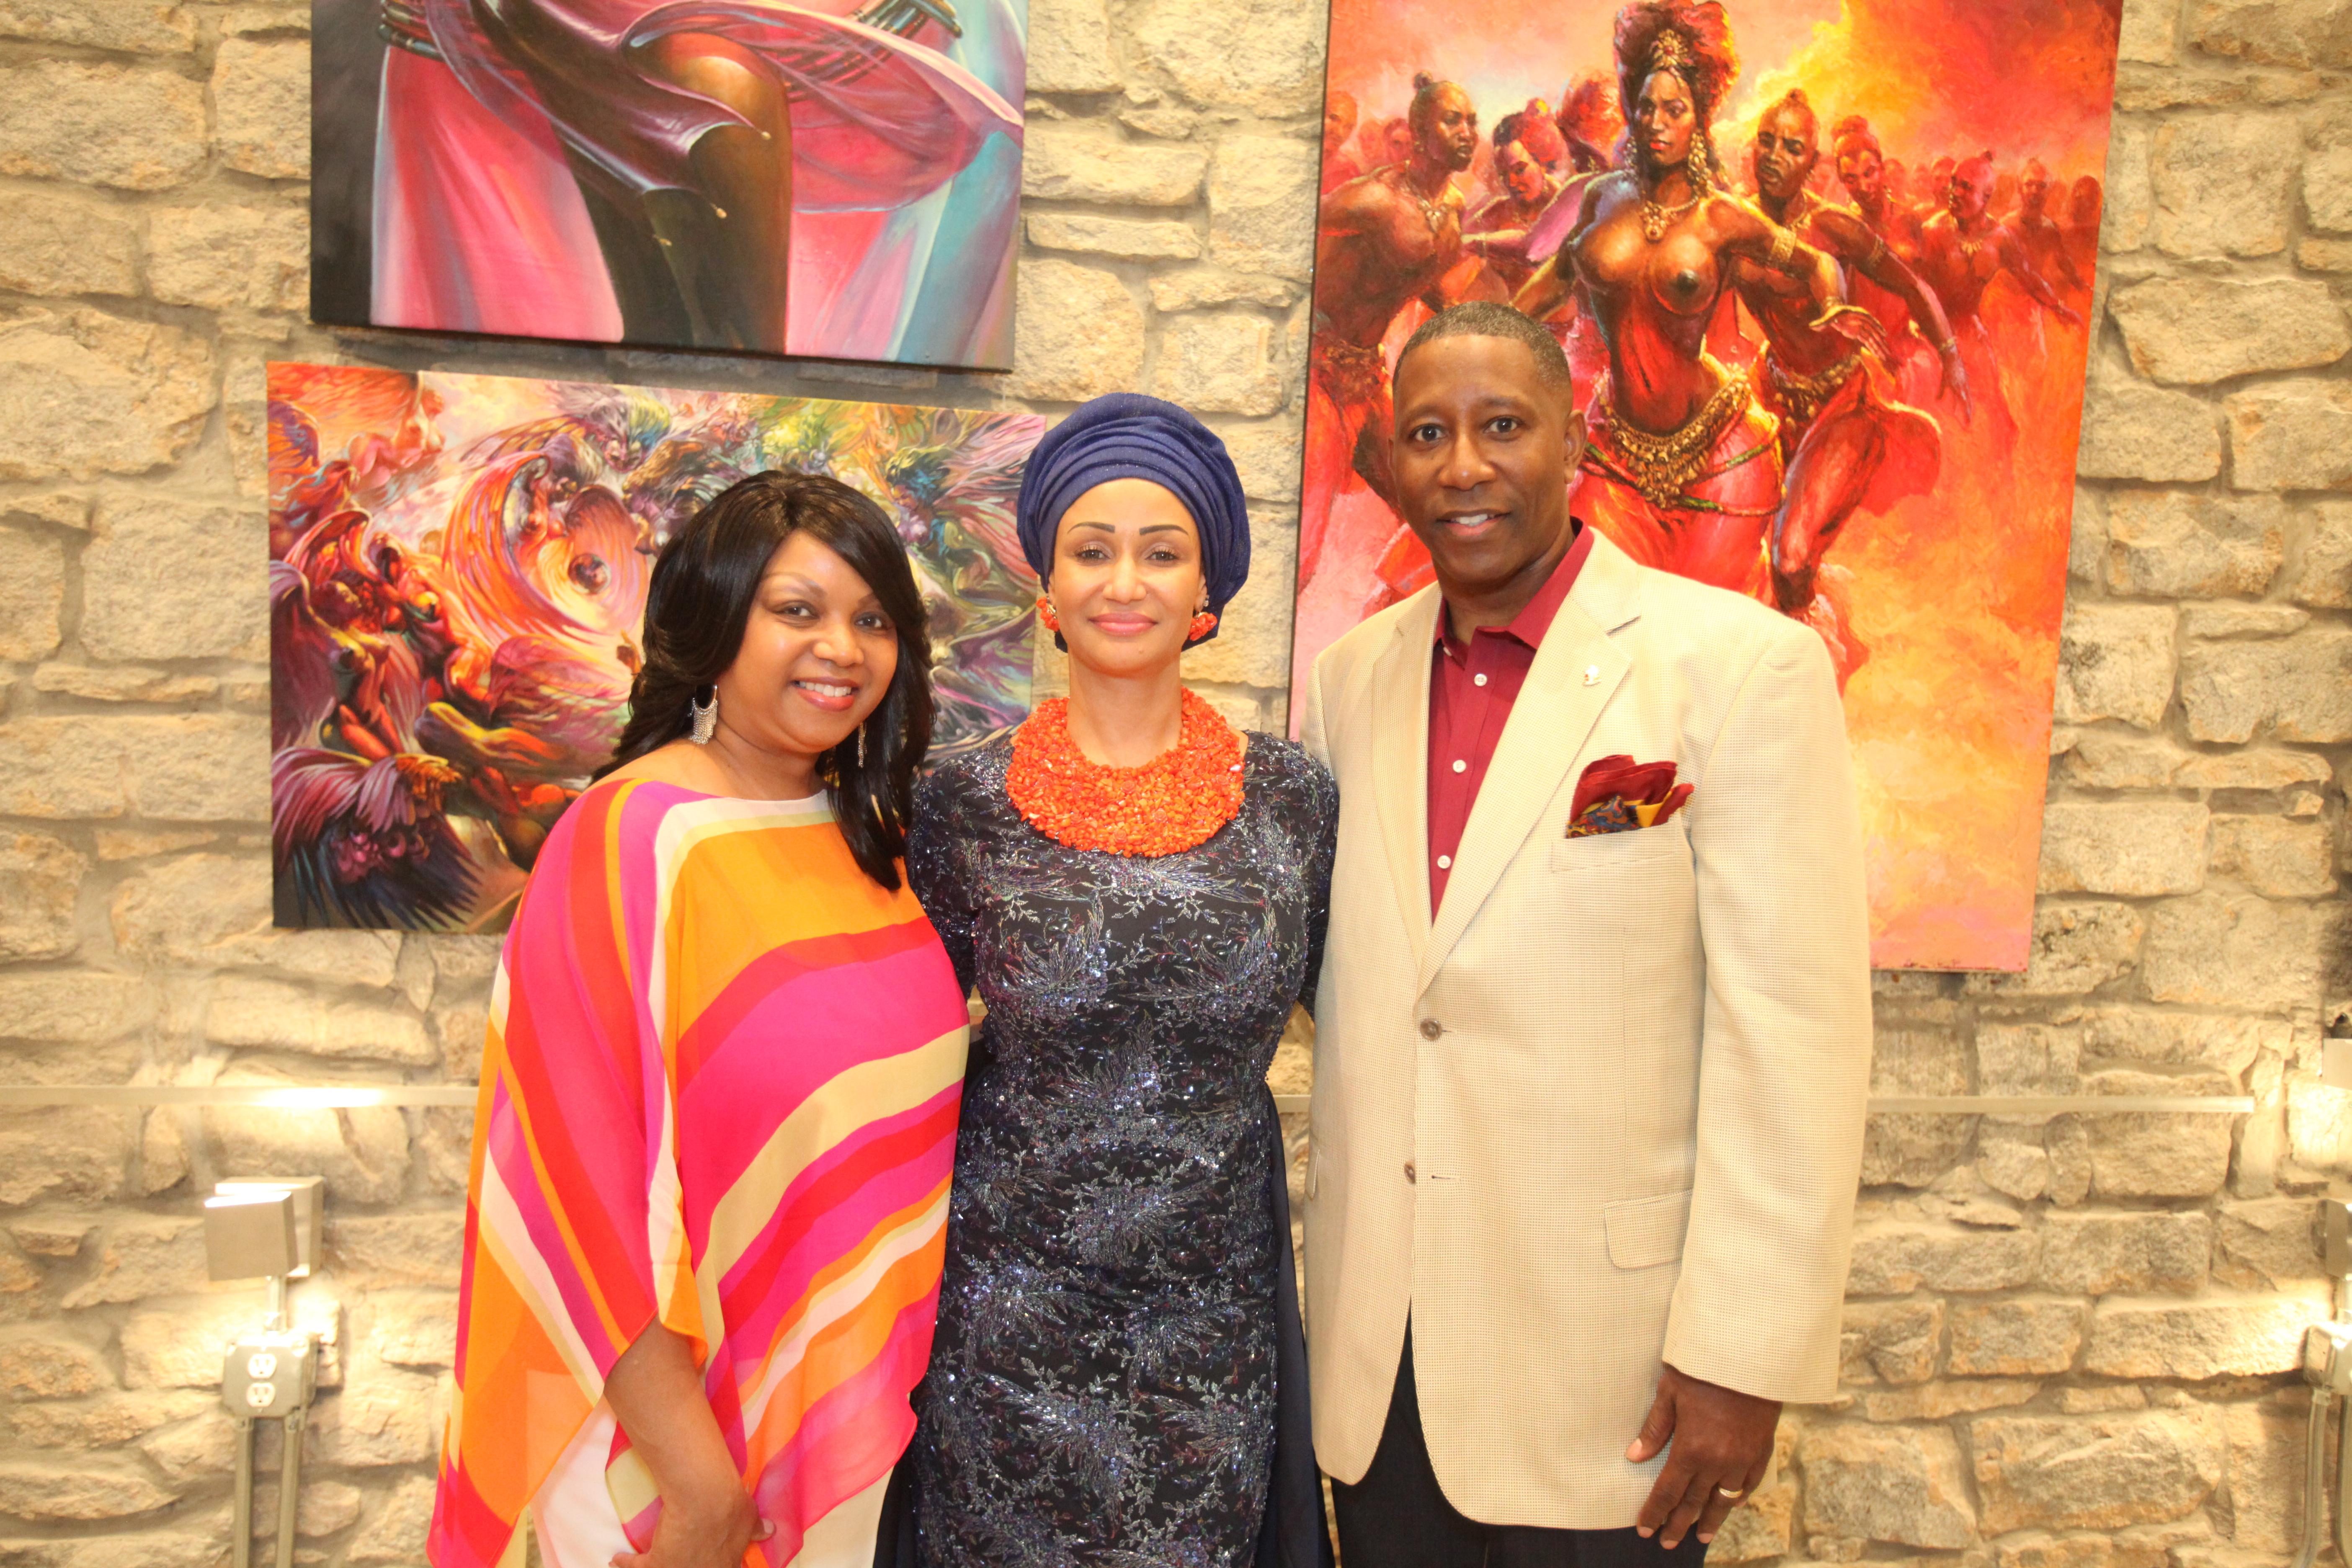 Mr and Mrs Ronald Stephens and Princess Modupe Ozolua